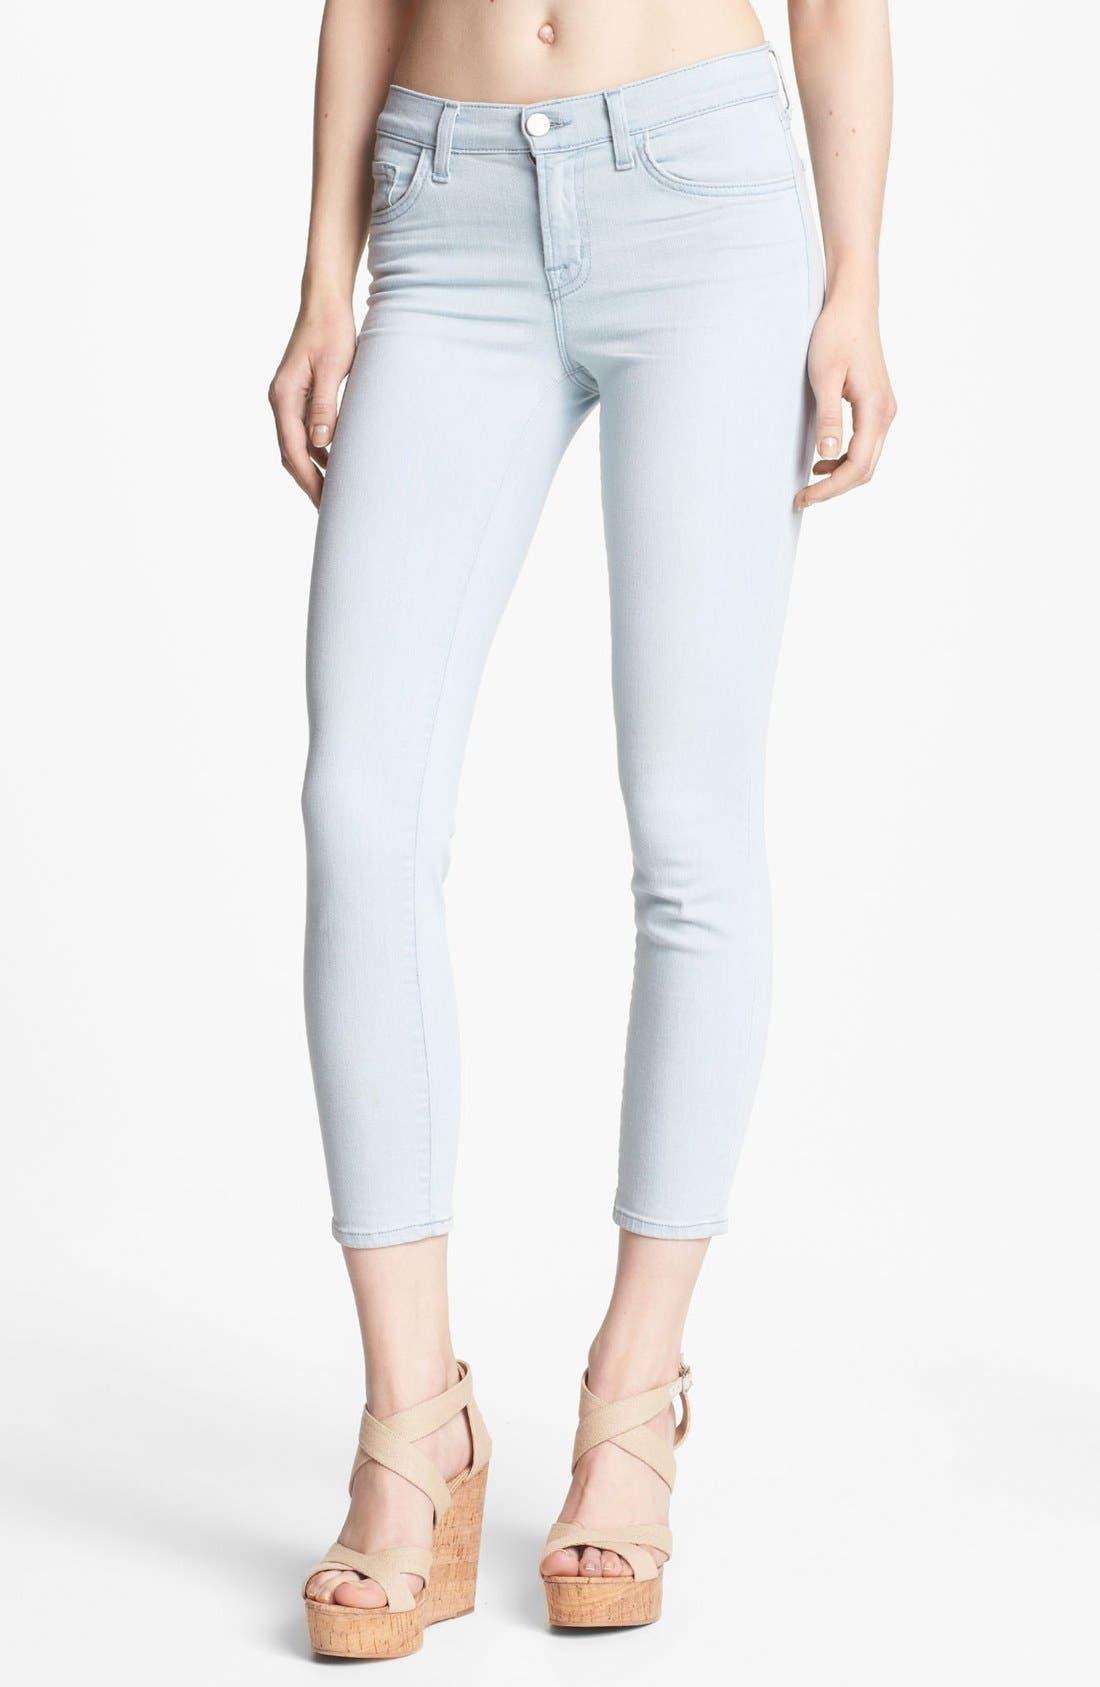 Alternate Image 1 Selected - J Brand Cropped Skinny Pants (Solana)